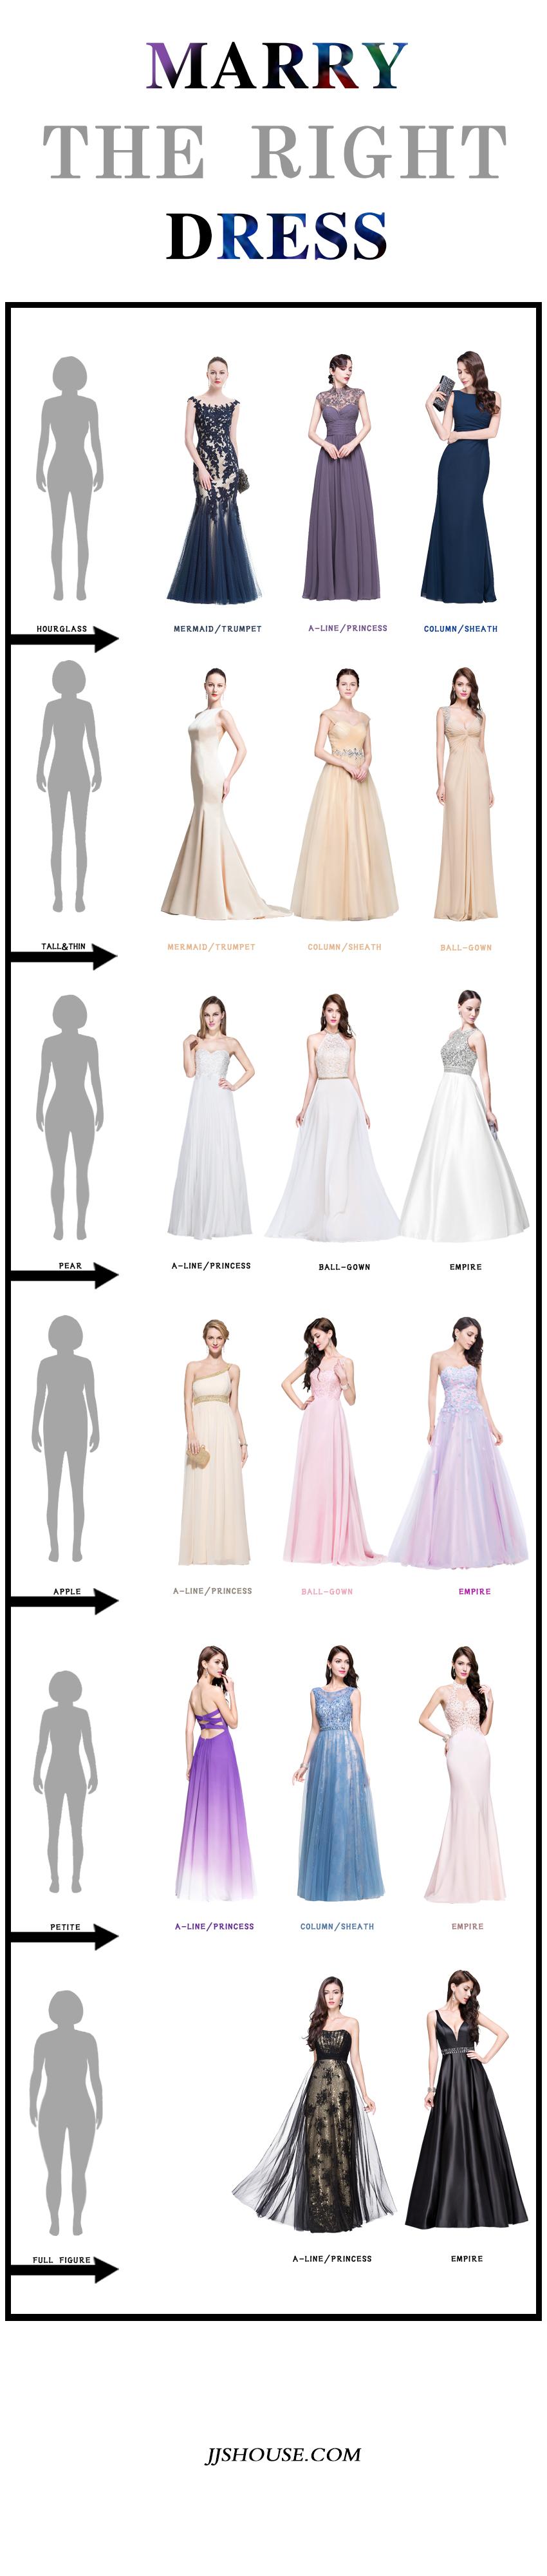 Wedding Dresses Bridal Dresses 2020 Empire Wedding Dress Wedding Dresses Online Wedding Dress